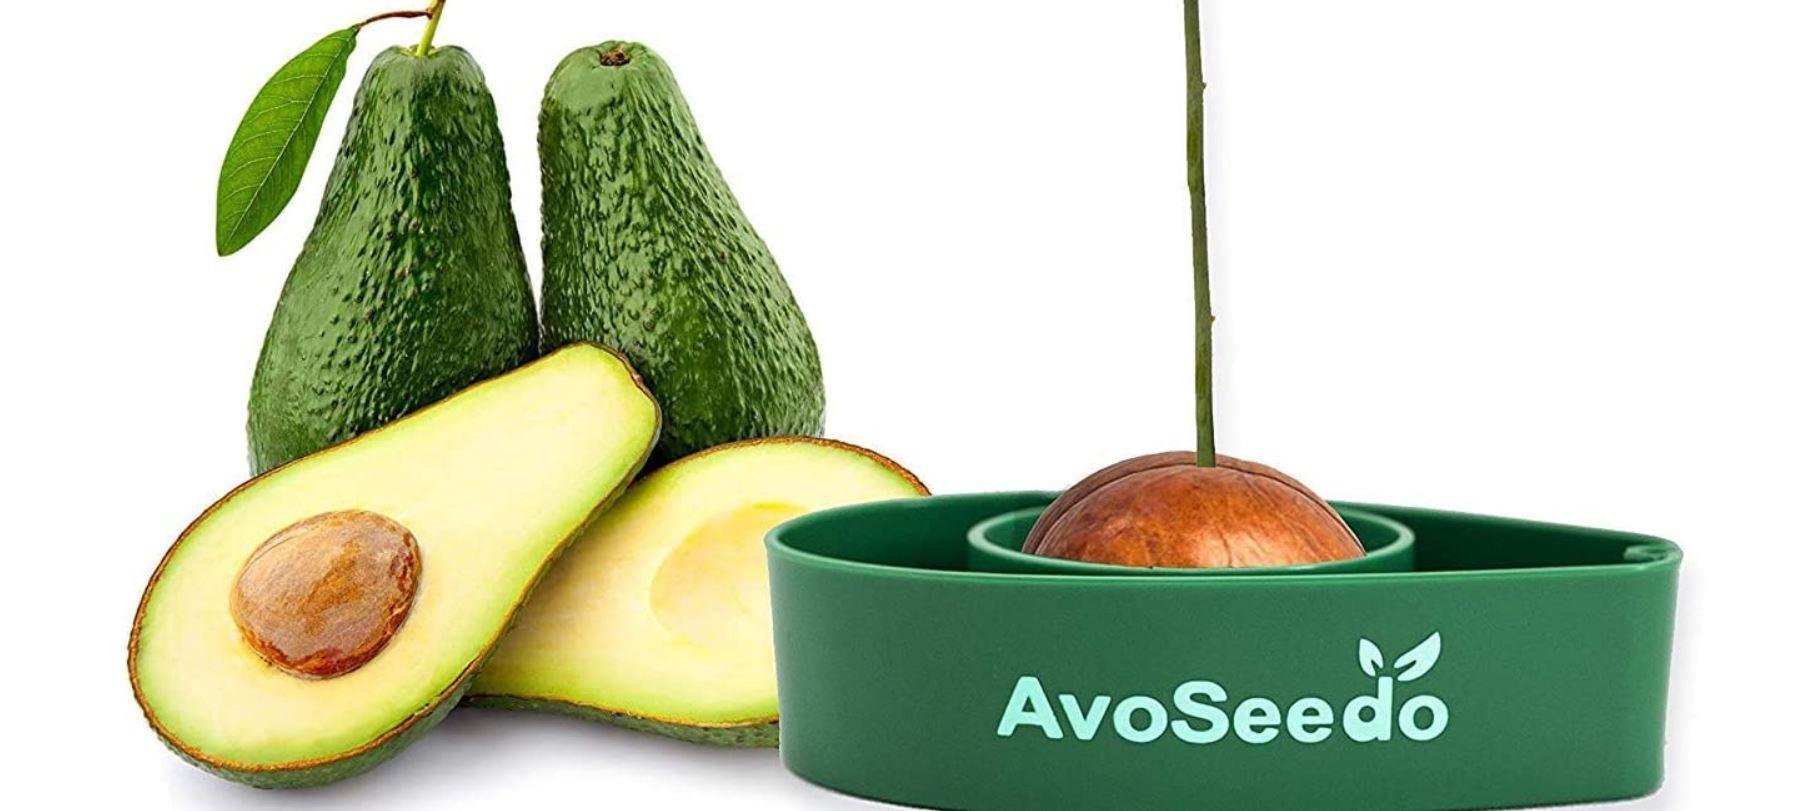 Avoseedo – Das Gadget für Hobby Gärtner